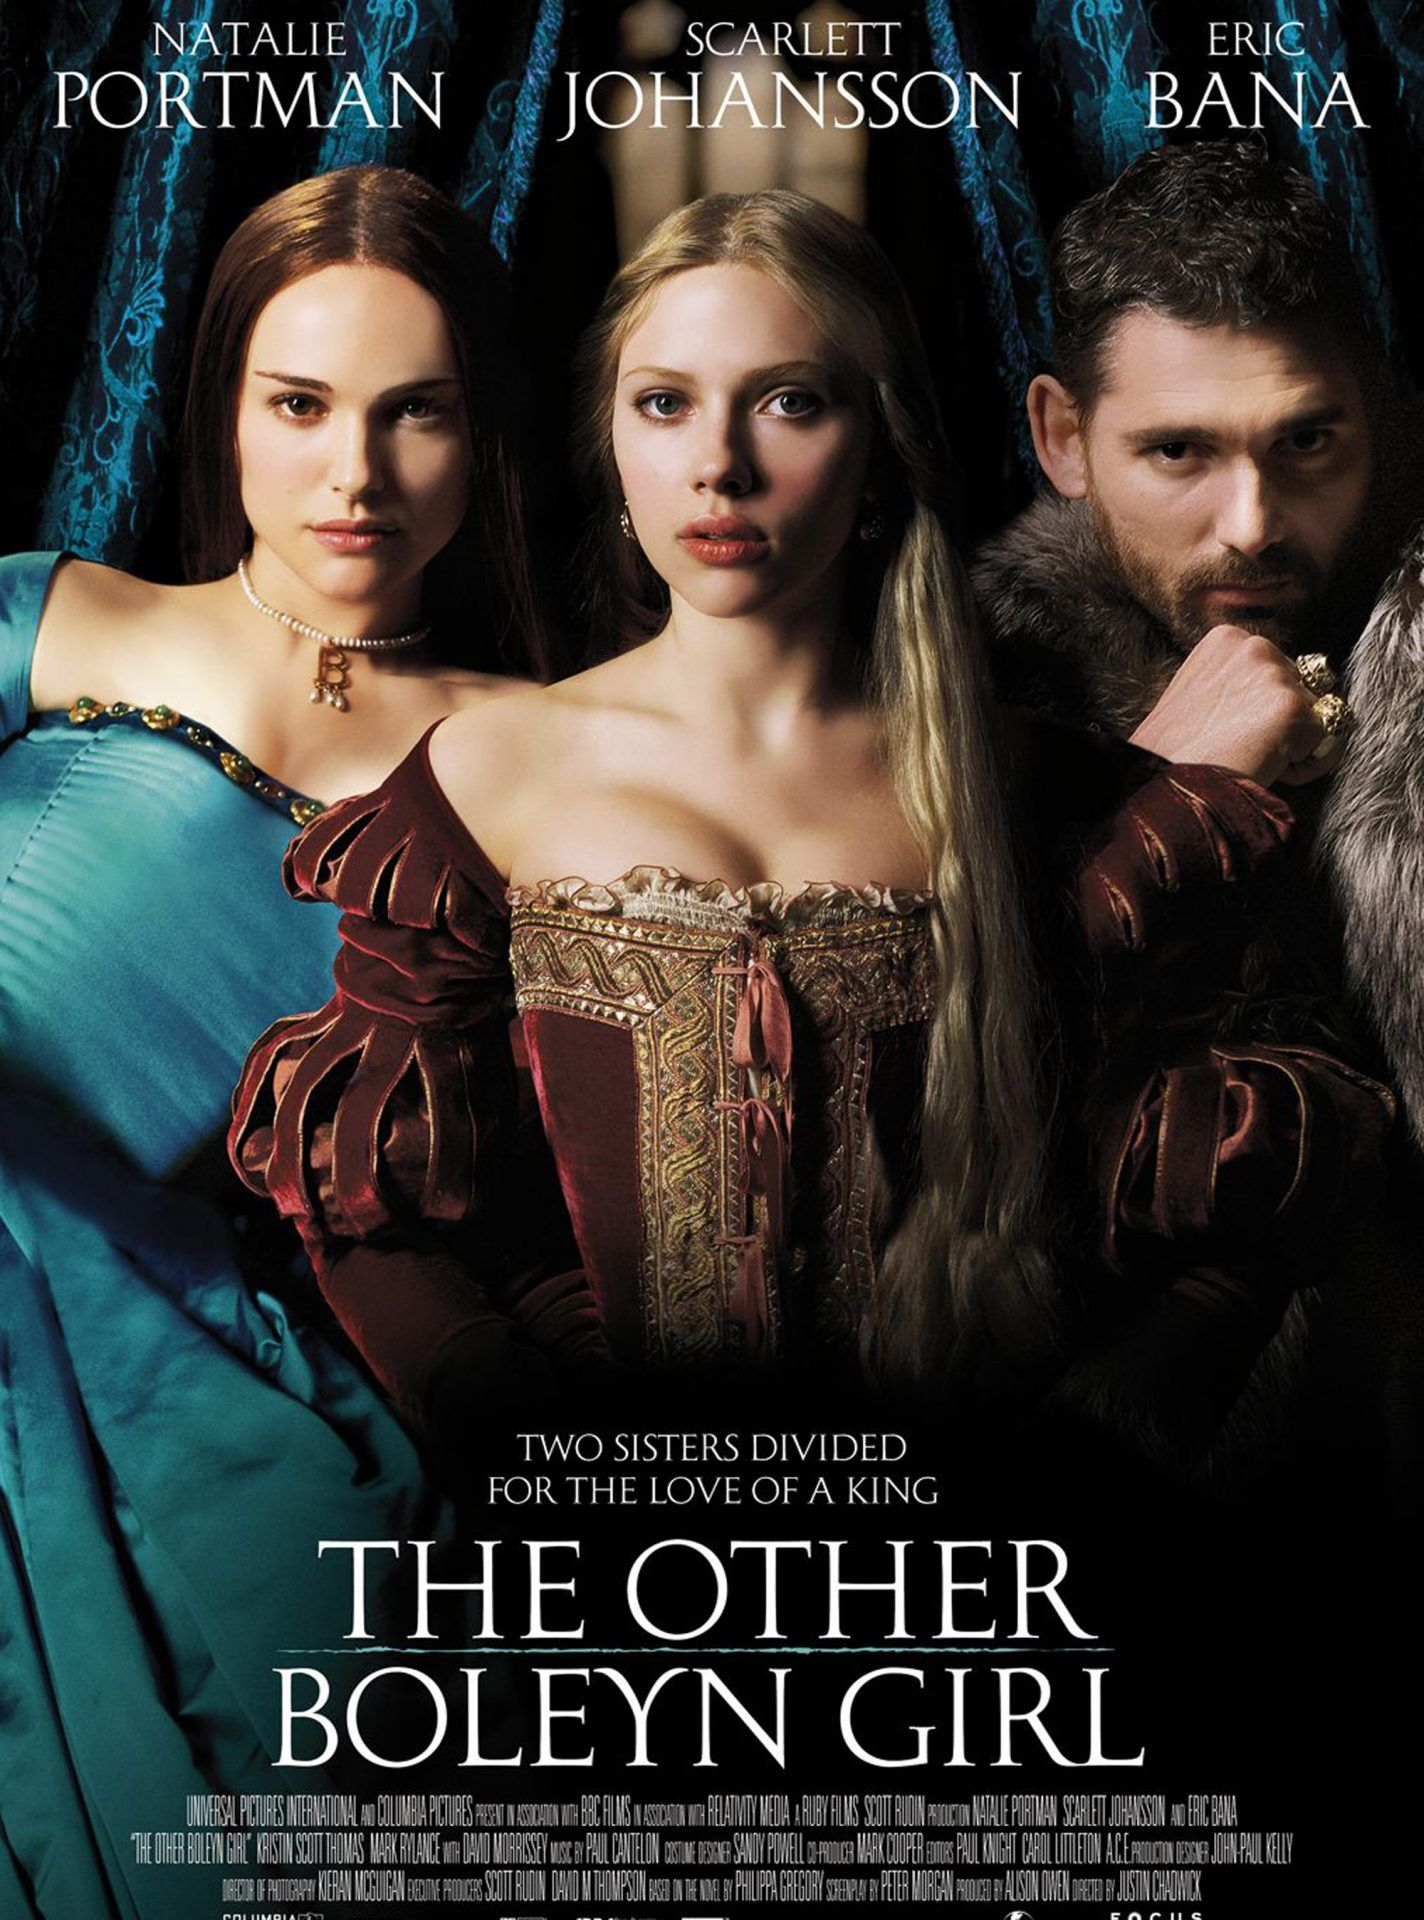 2 Soeurs Pour Un Roi : soeurs, Royal, Movies, Movies,, Film,, Other, Boleyn